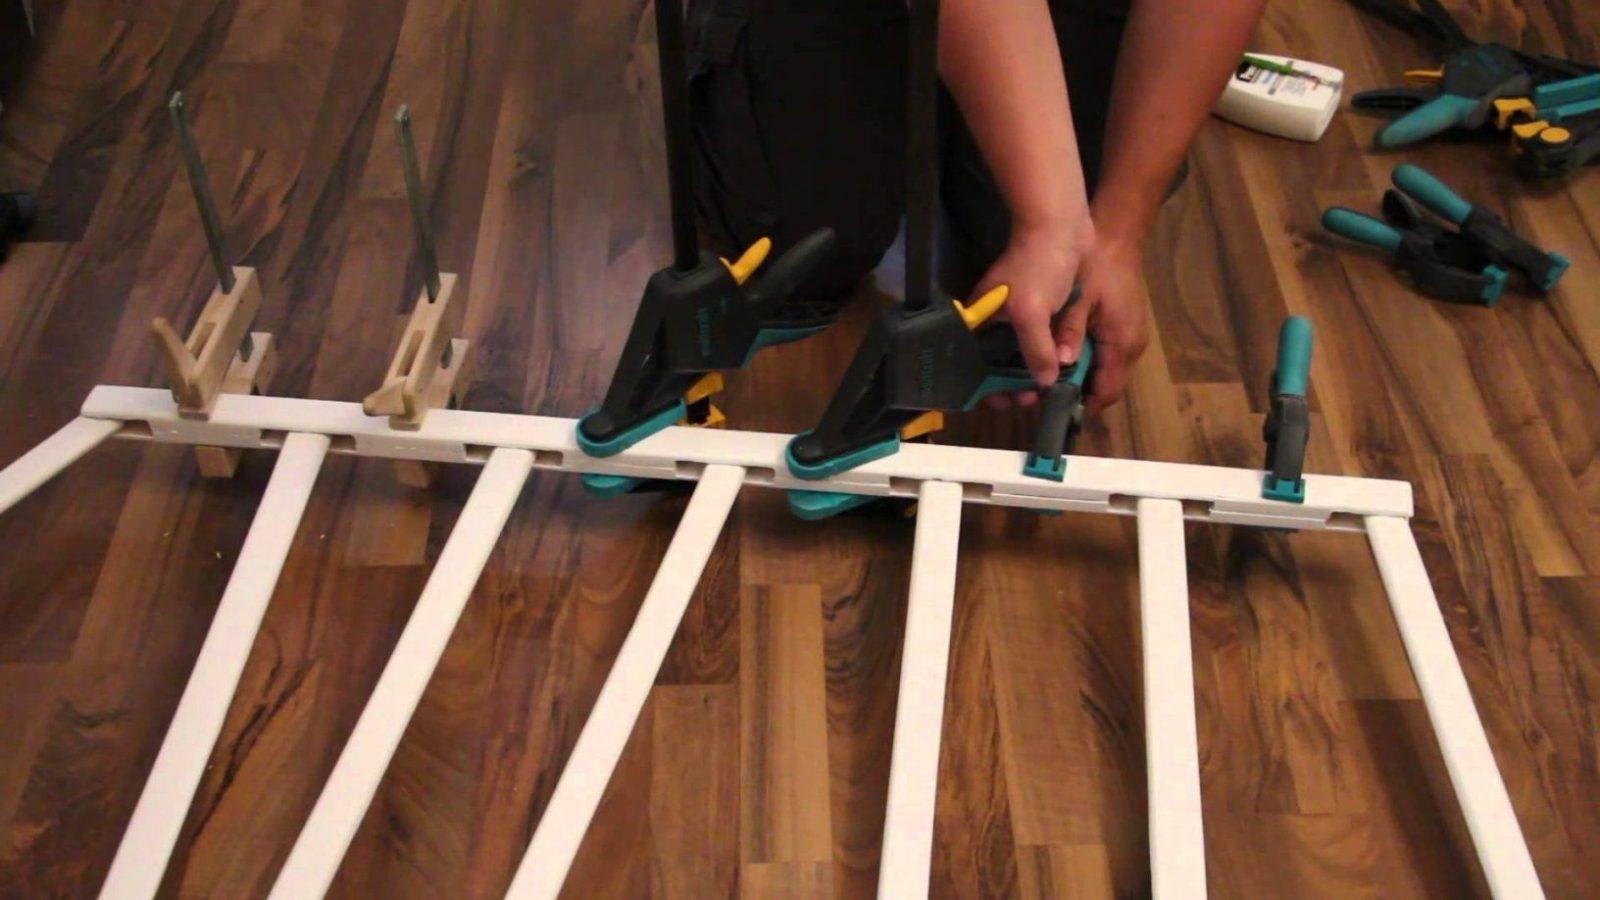 kindersicherung treppe selber bauen haus design ideen. Black Bedroom Furniture Sets. Home Design Ideas